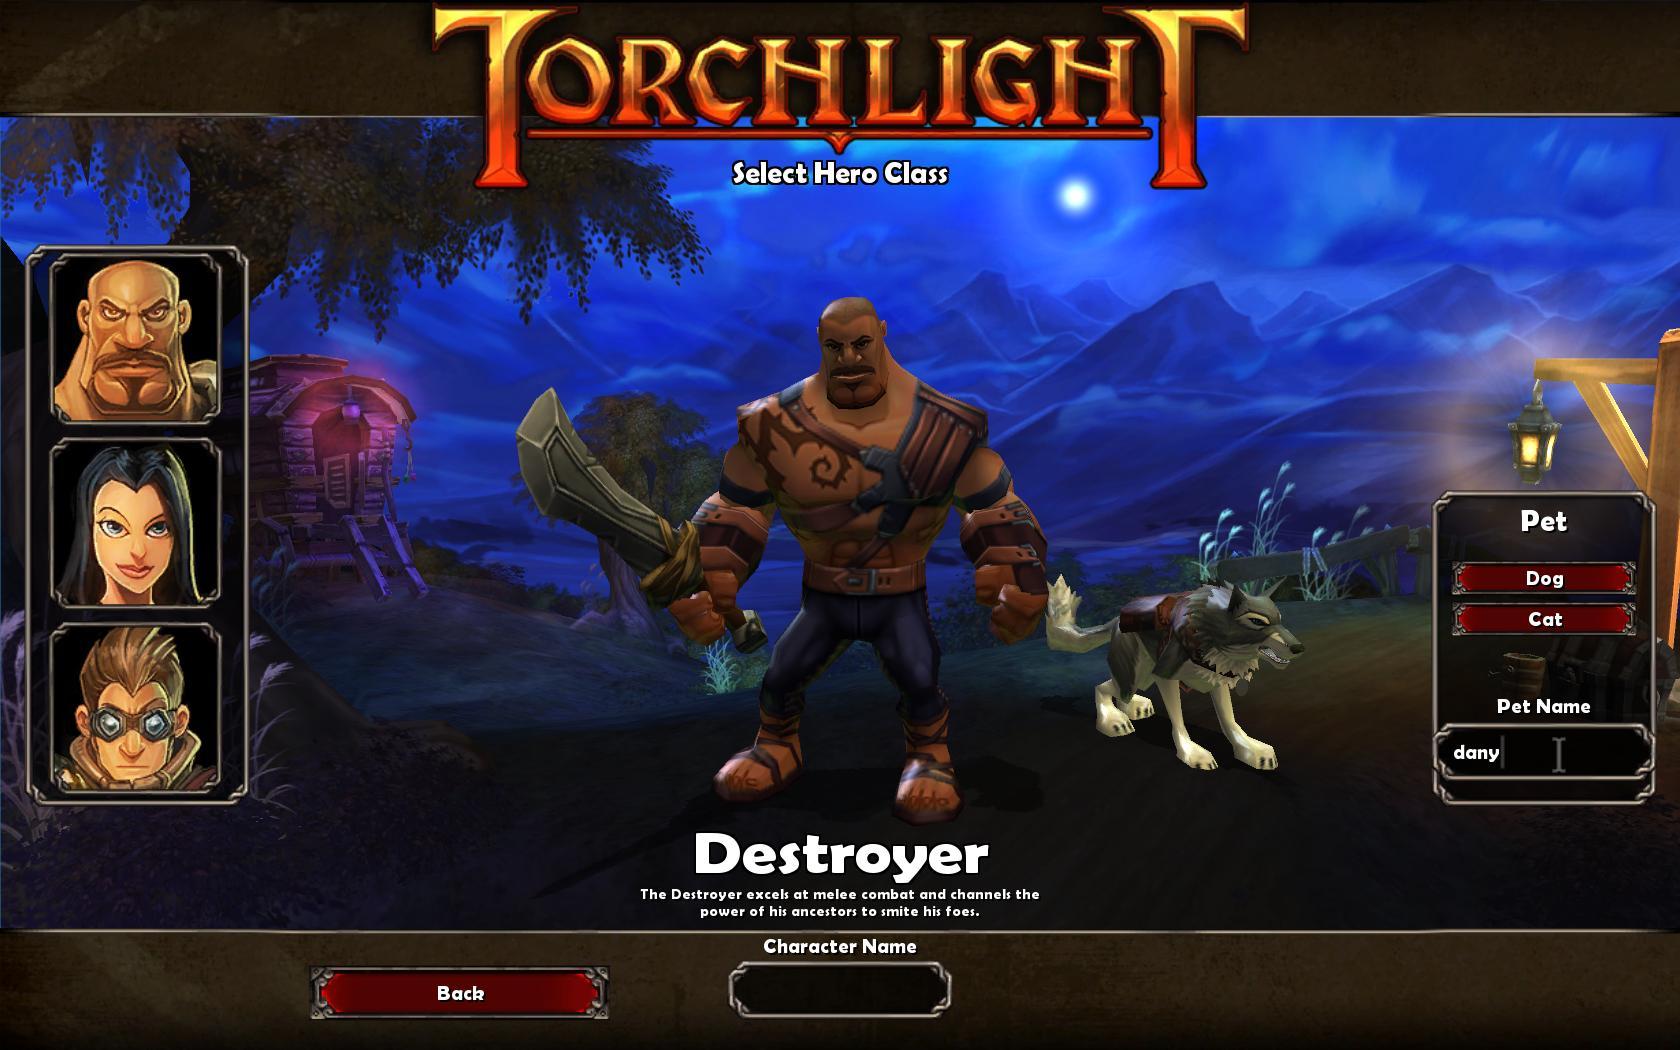 Torchlight 2009-10-28 21-54-01-62